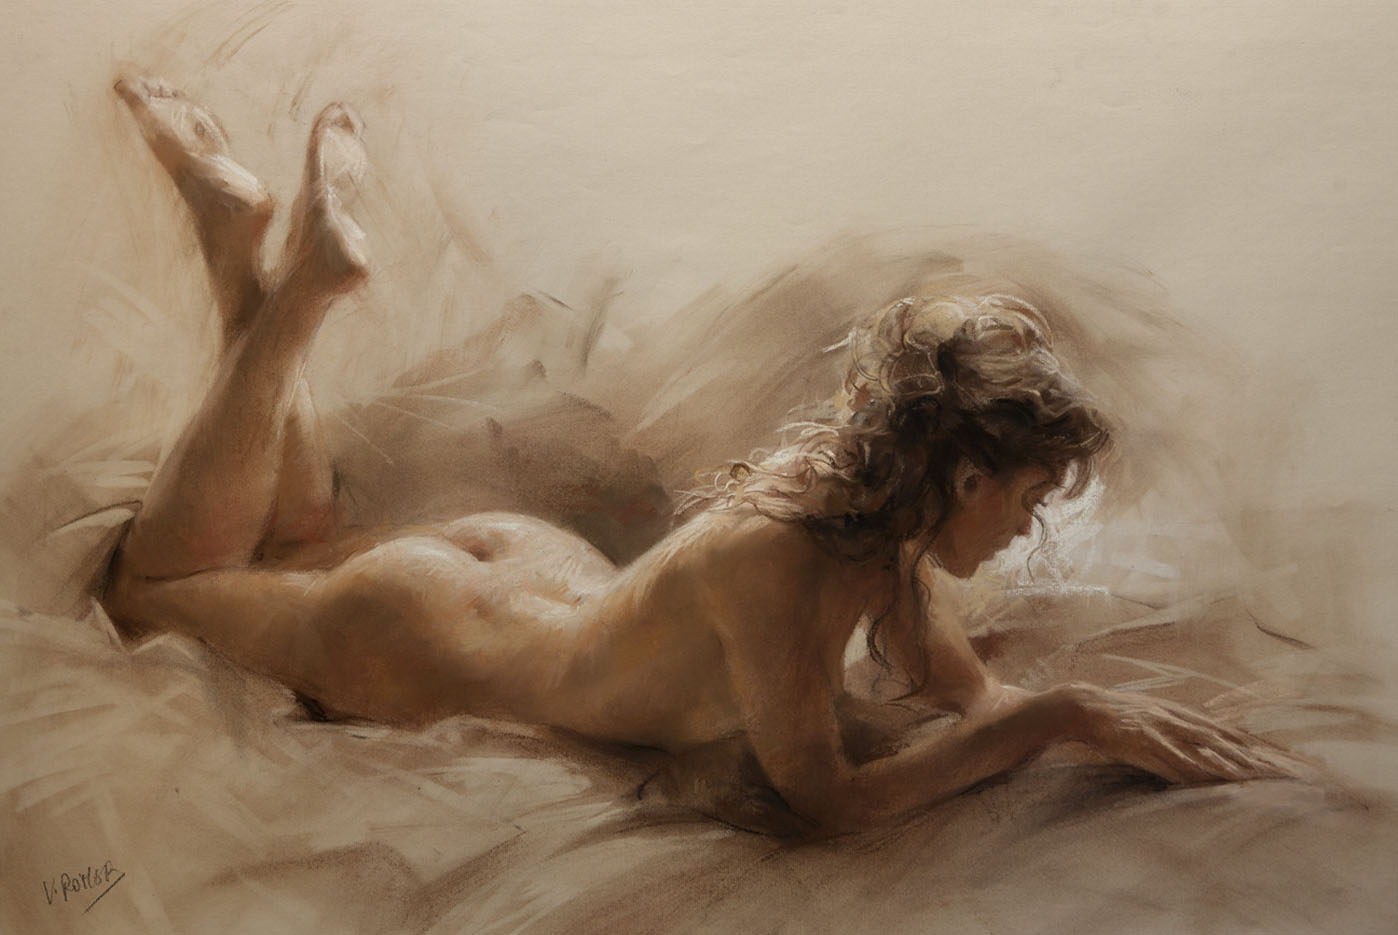 Romanticism Original Art For Sale, Buy Romanticism Original Art Online